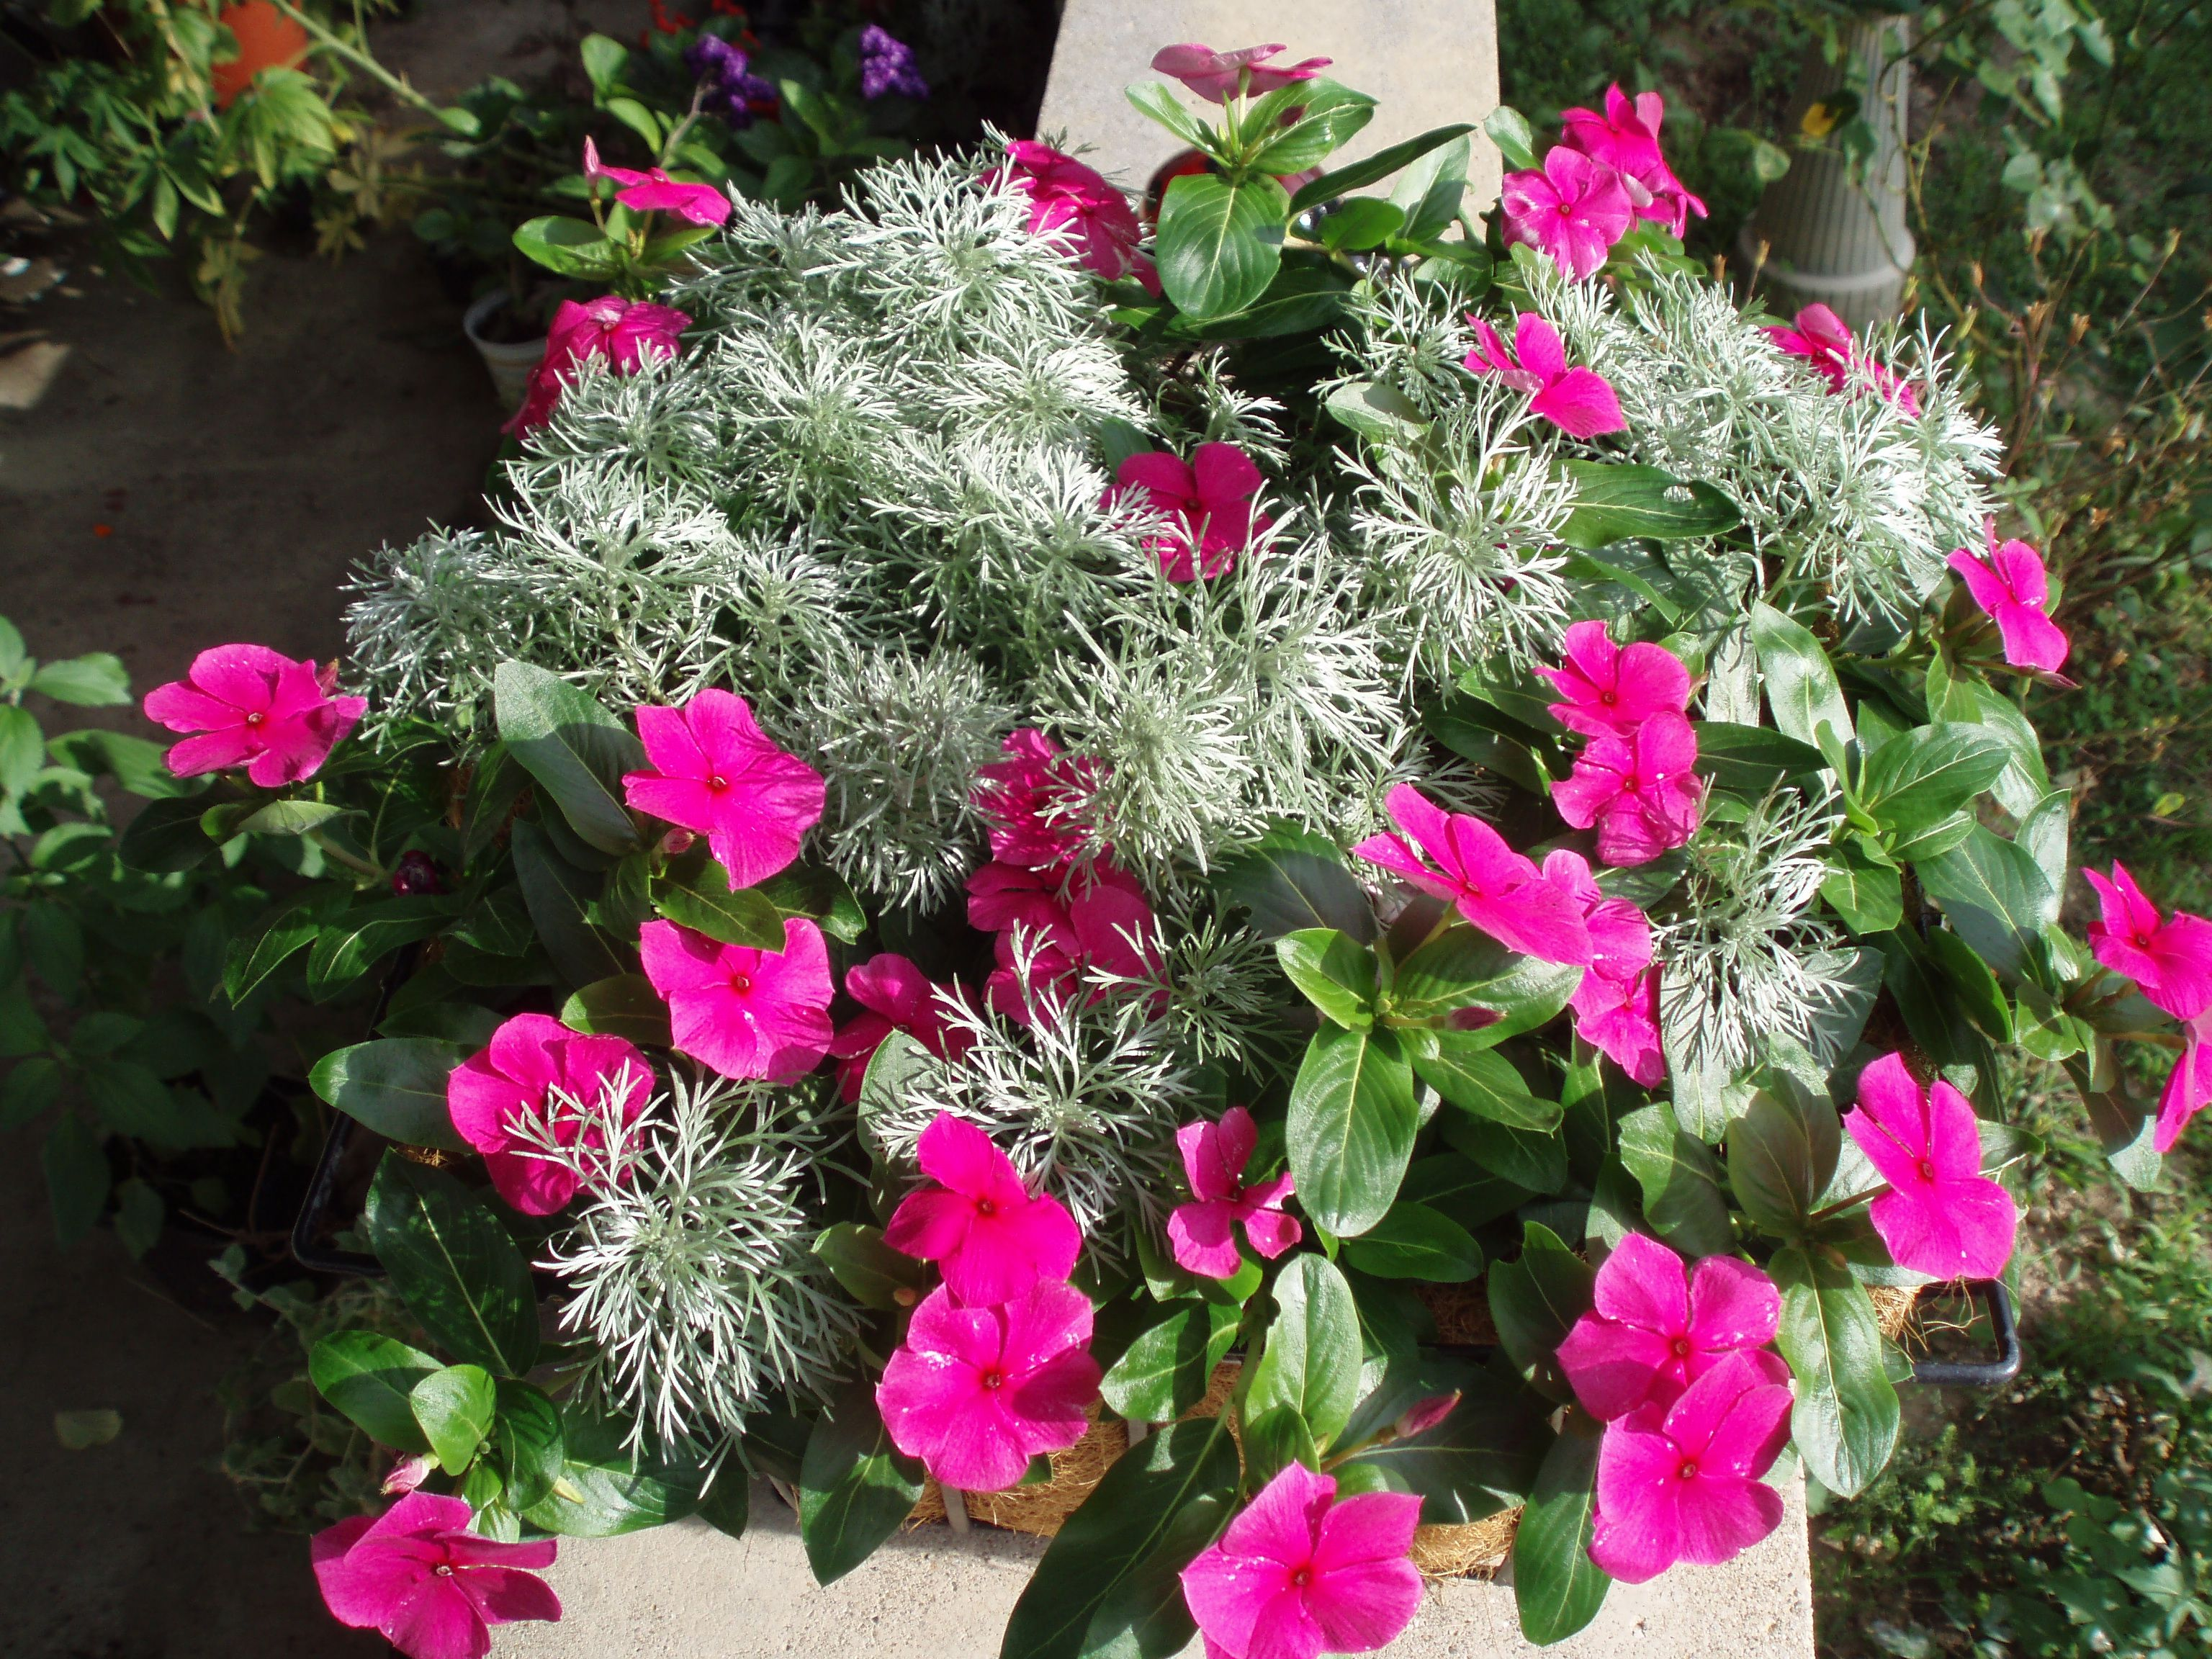 Mixing Annual Vinca With Perennial Silver Mound Artemisia Makes A